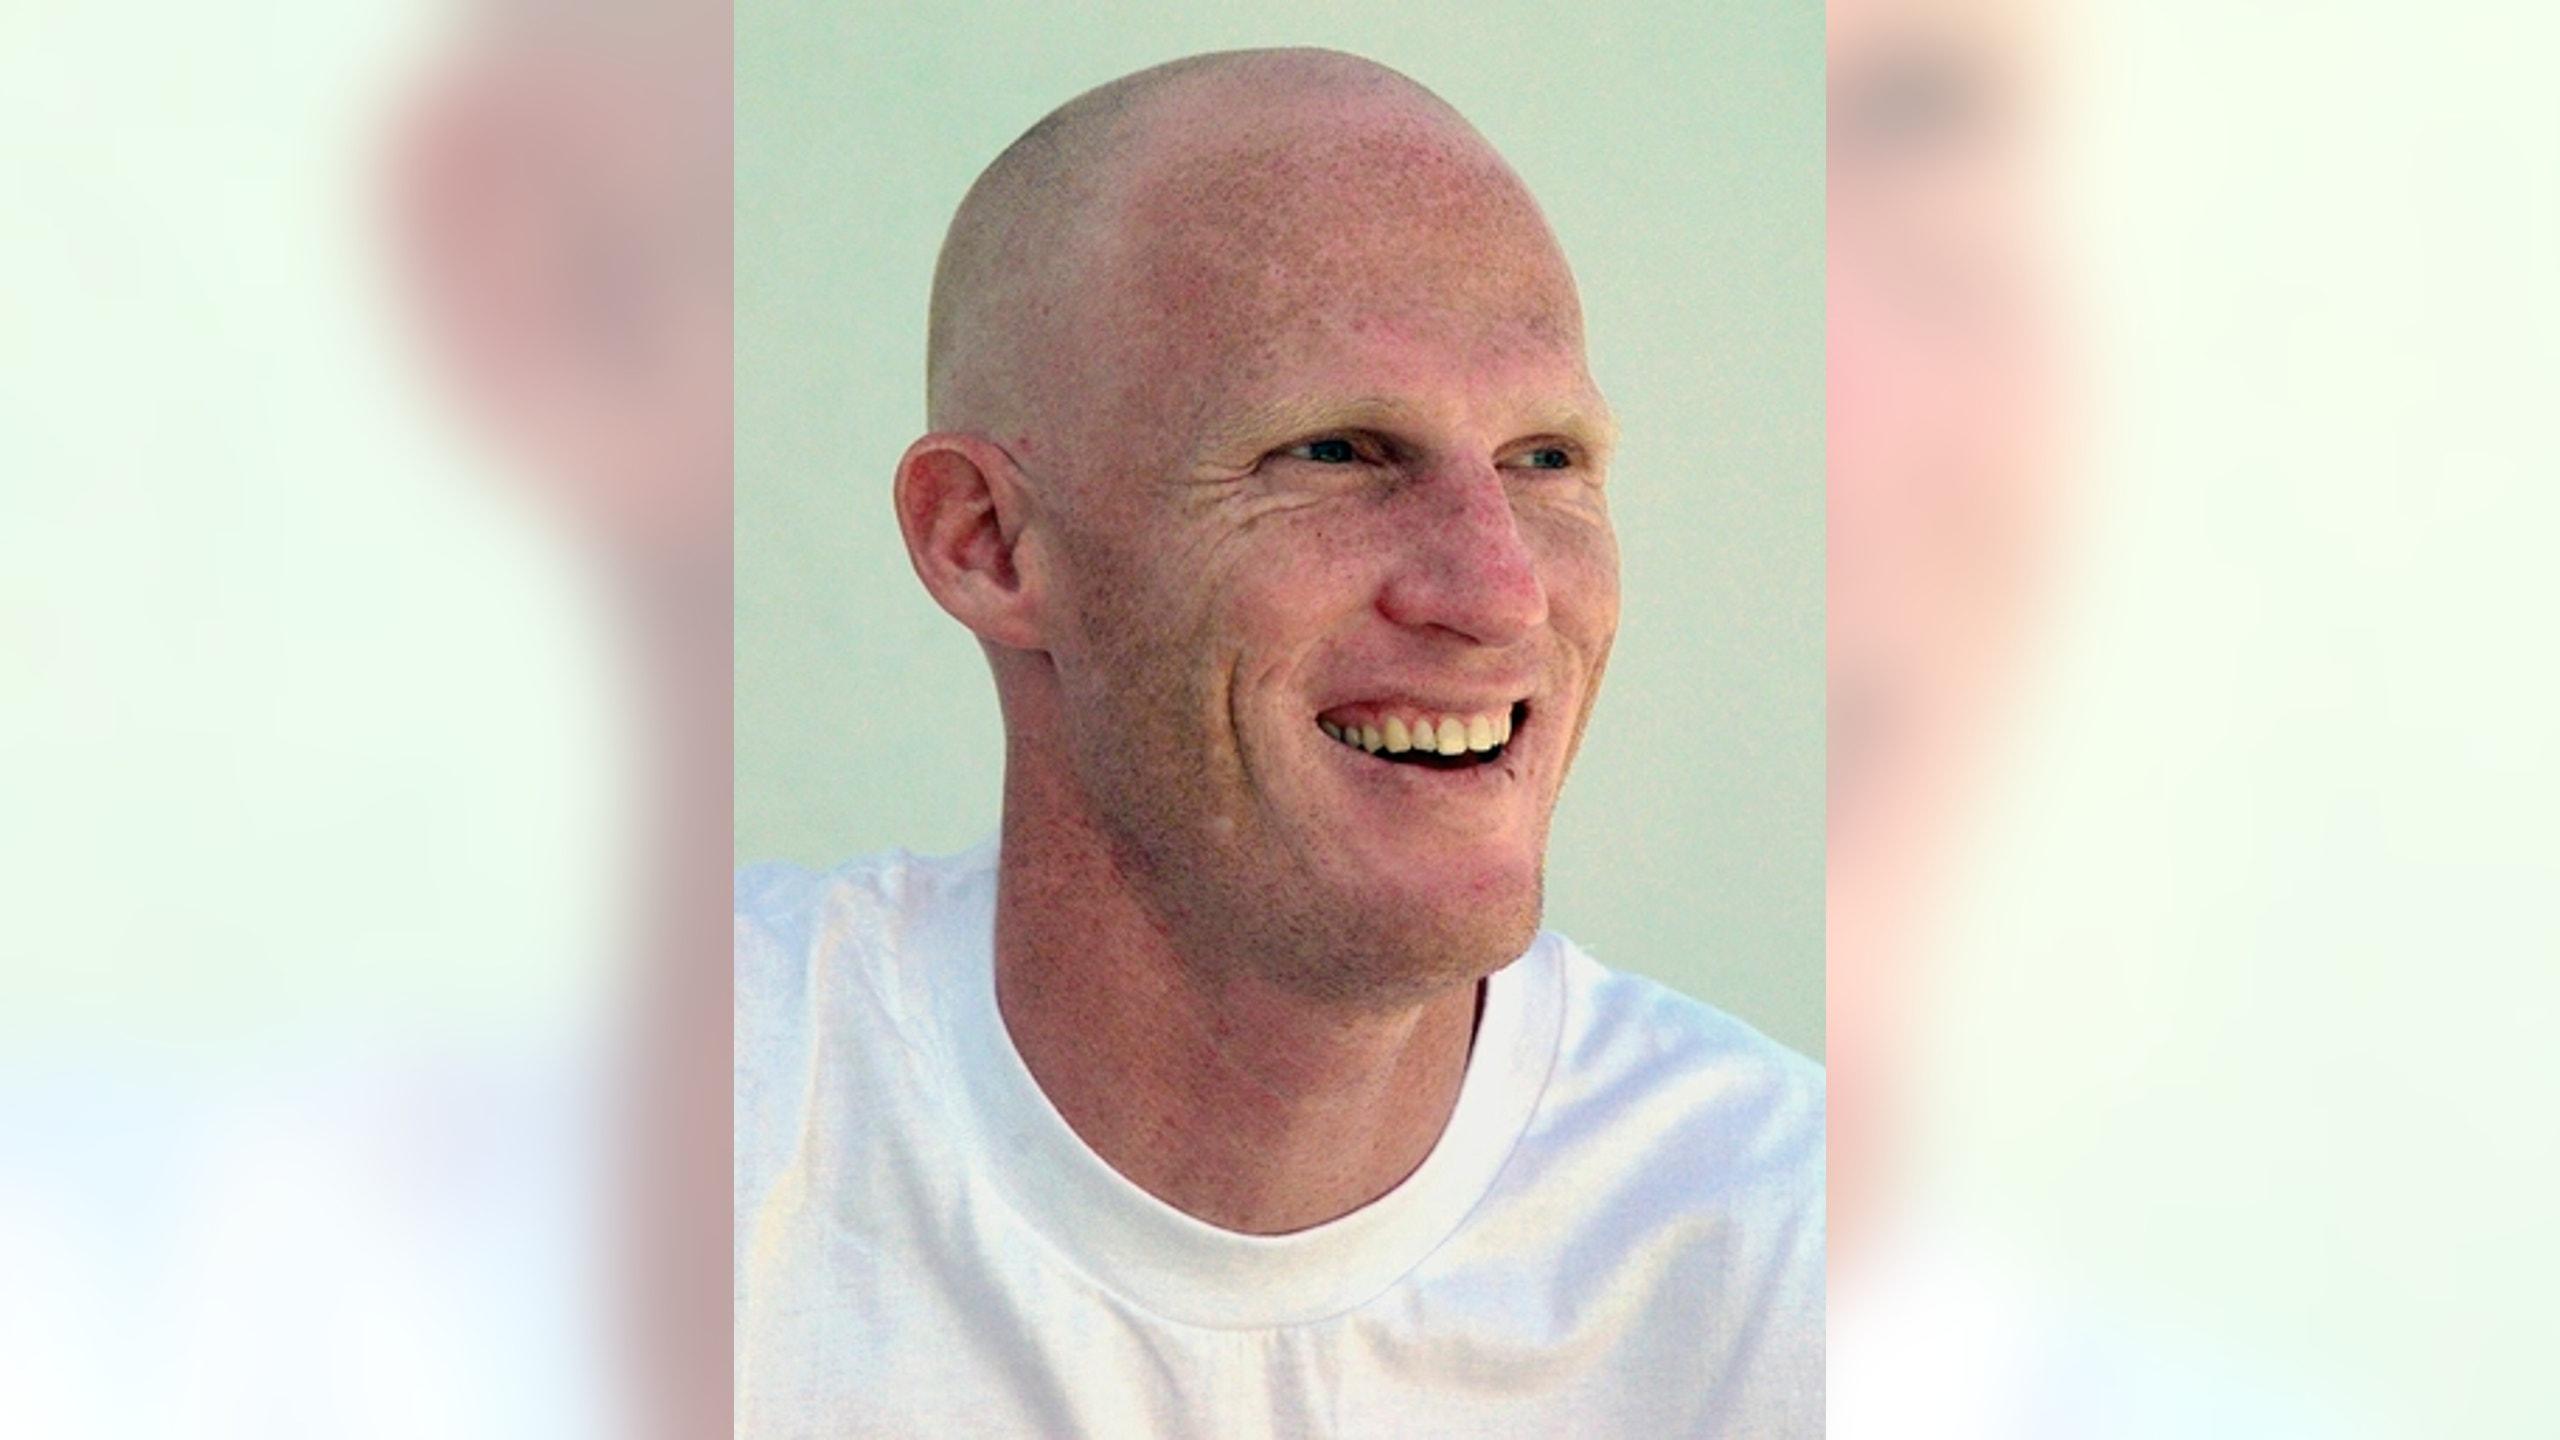 Former Raiders QB Todd Marinovich Pleads Guilty to Drugs